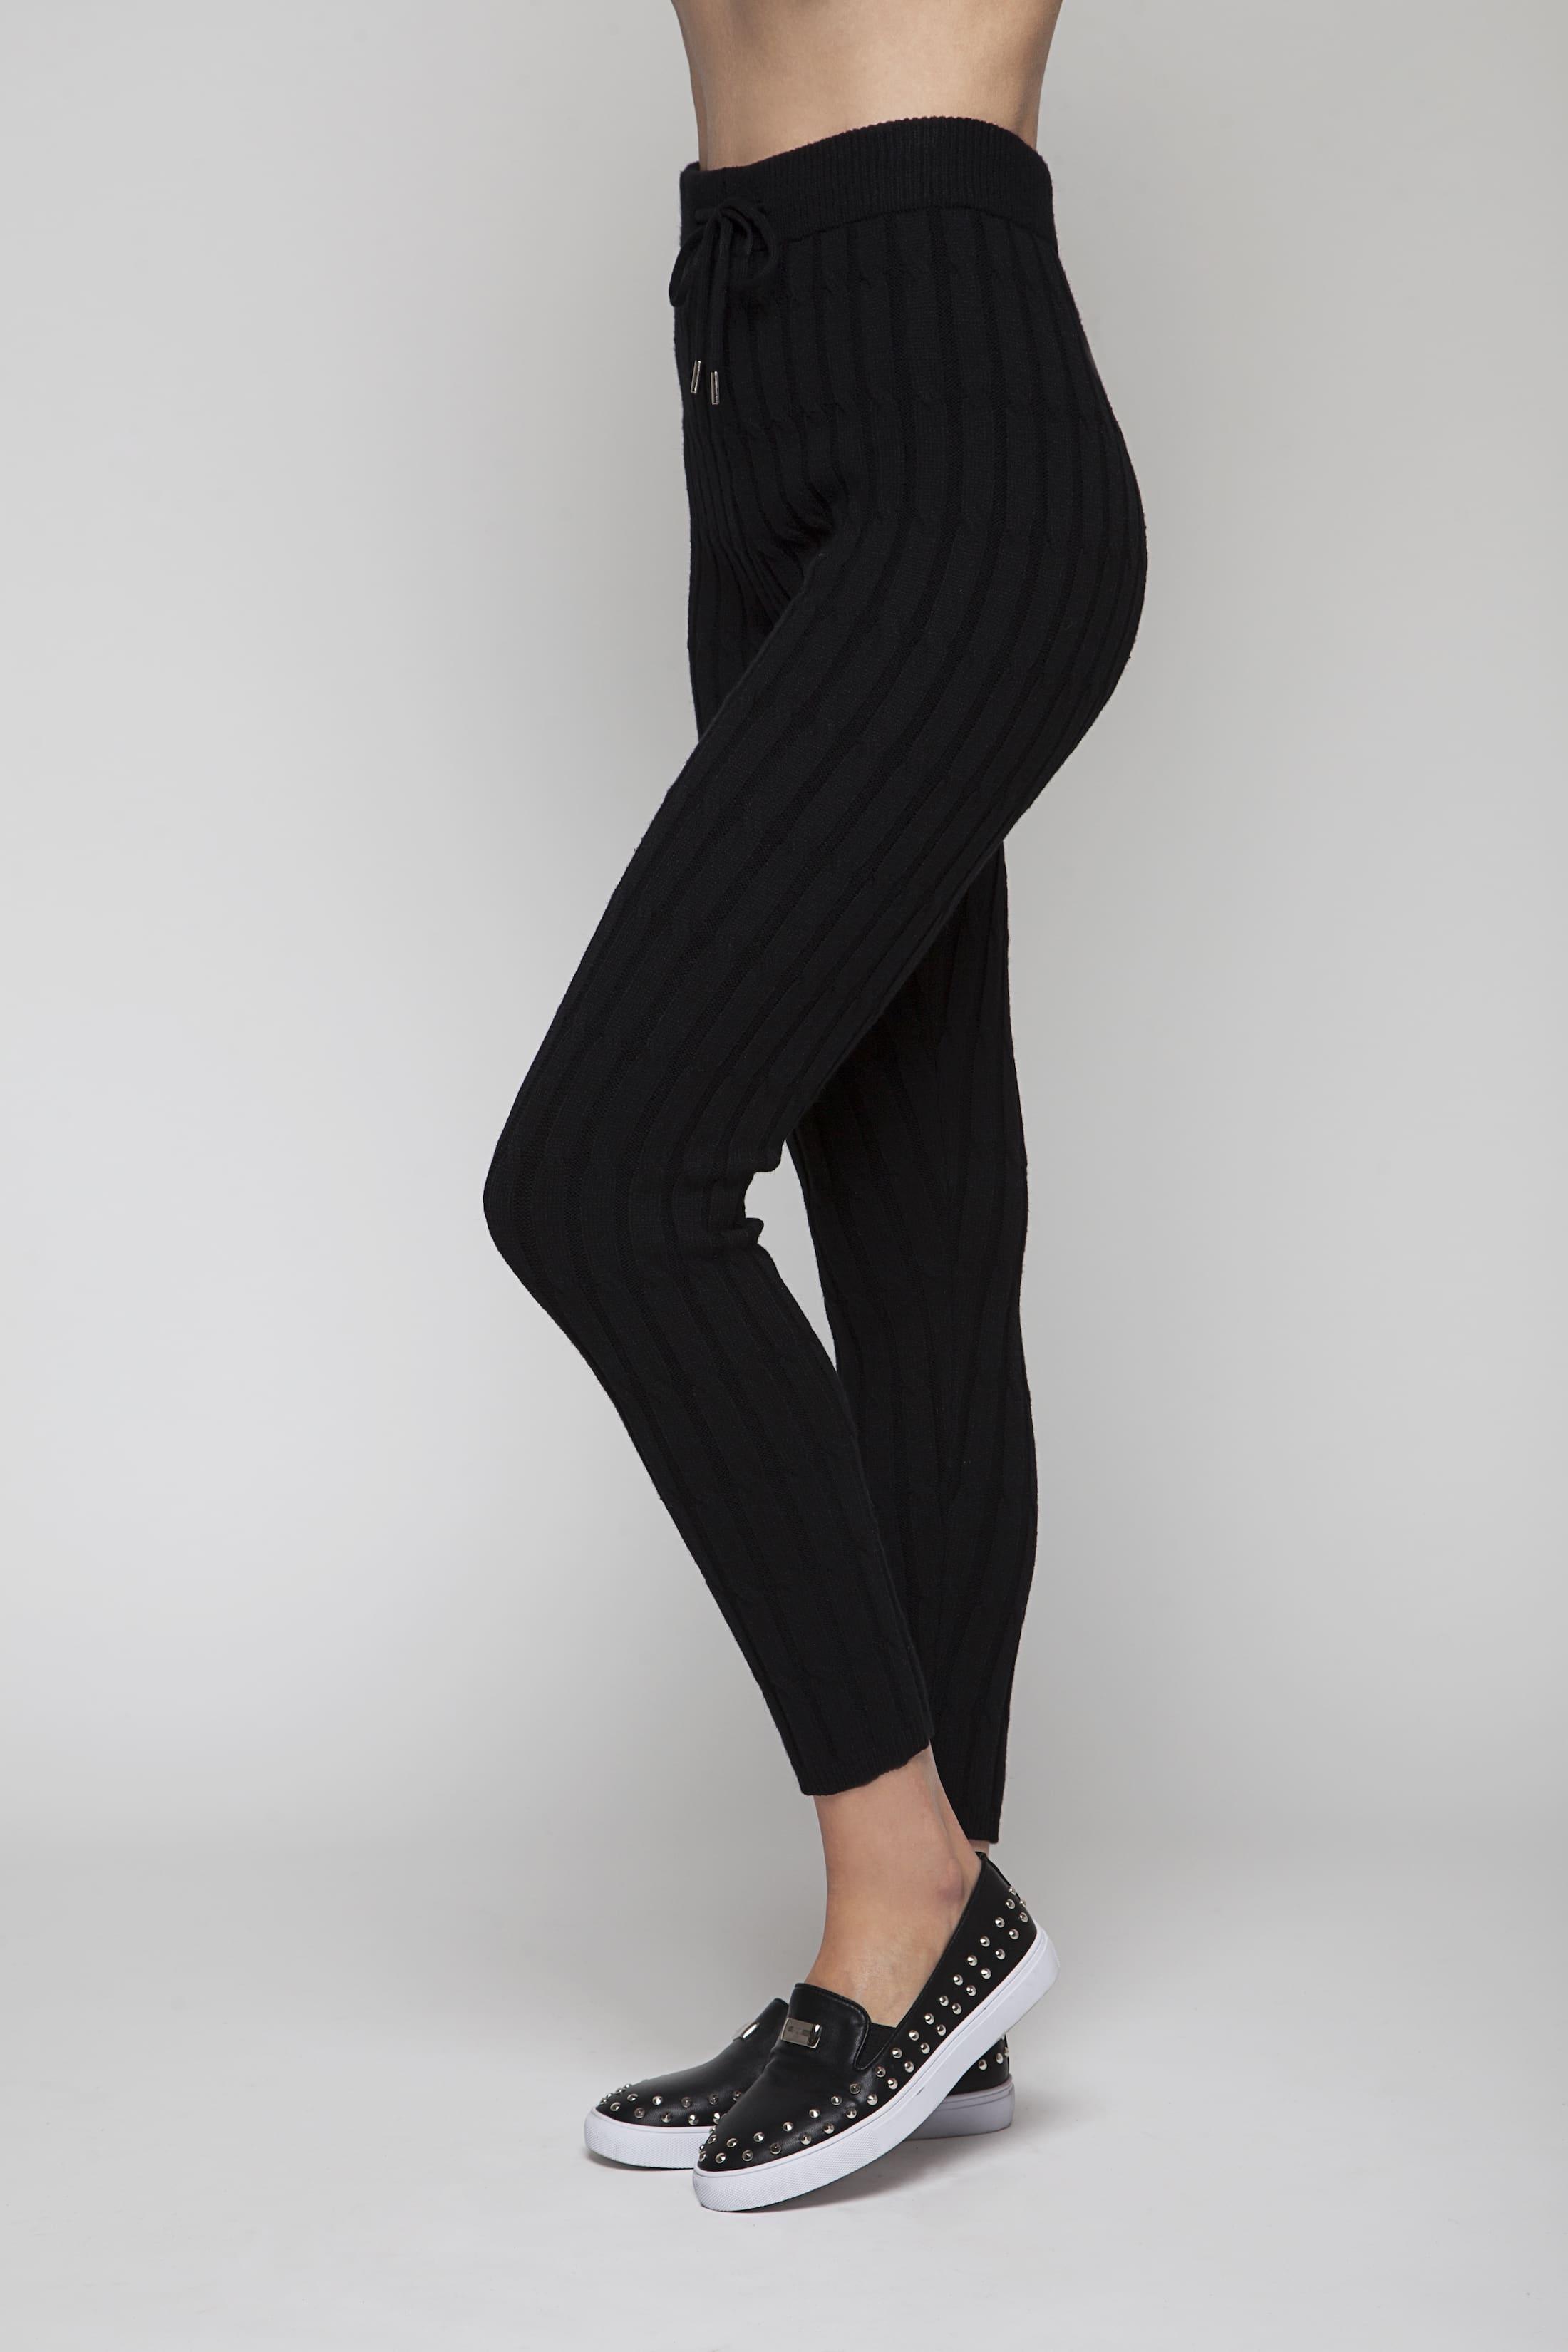 Black soft knitted loungewear pants